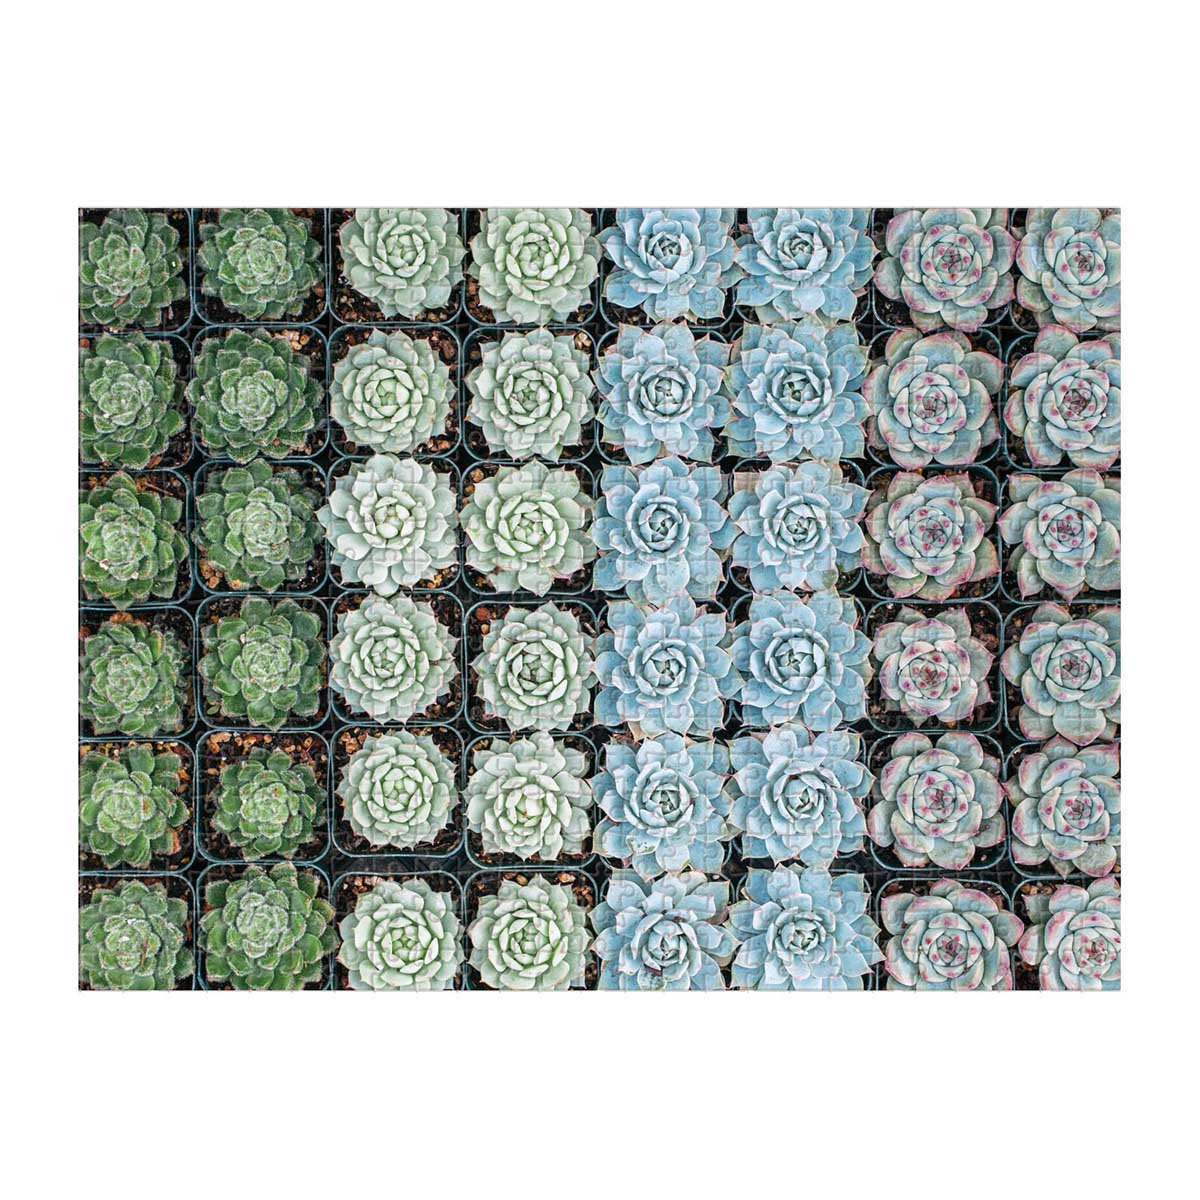 Succulent Garden Garden Jigsaw Puzzle